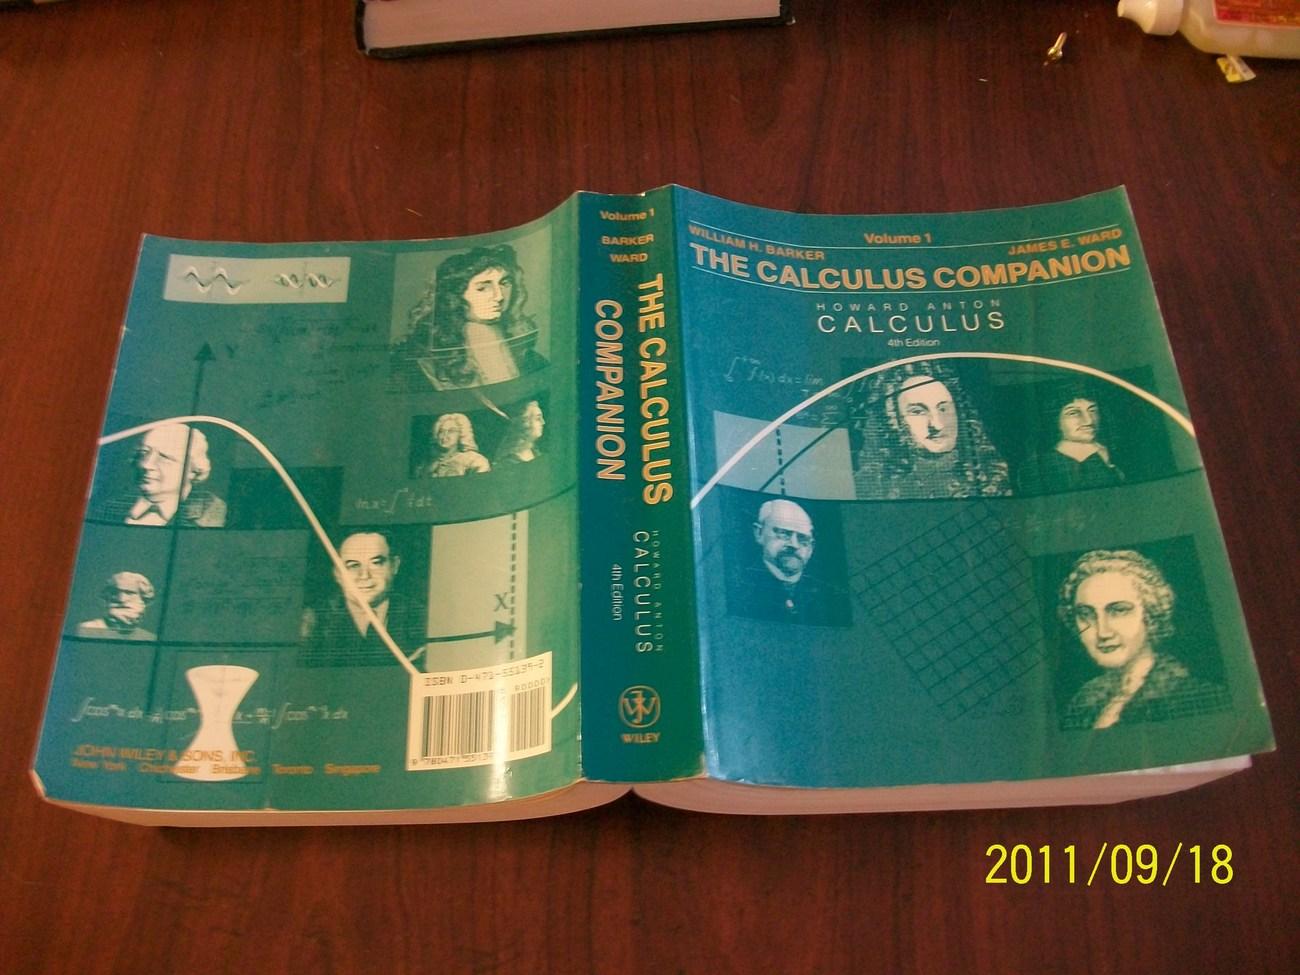 Calculus companion volume 1 to accompany calculus, howard an